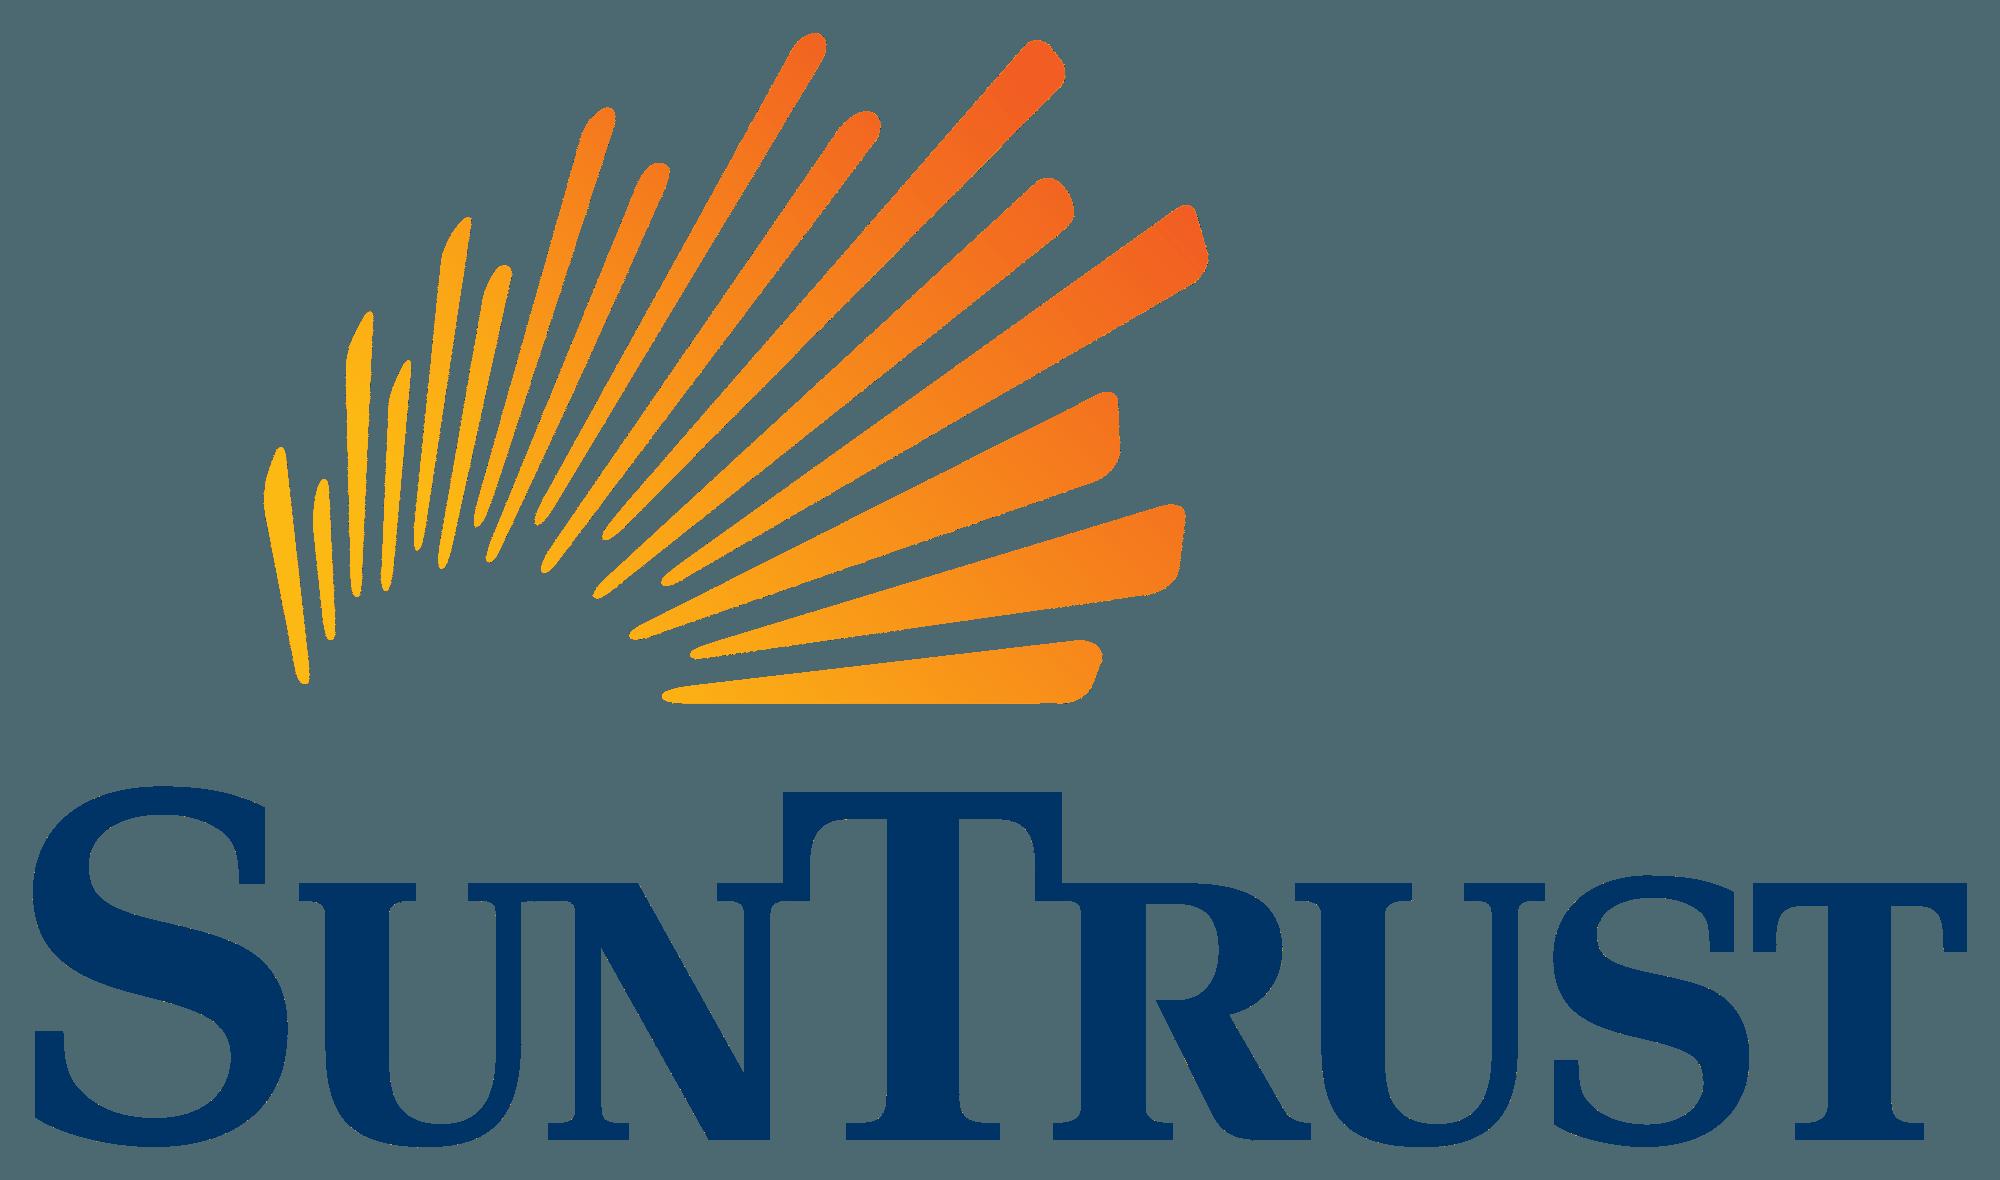 Suntrust realestate client advisor